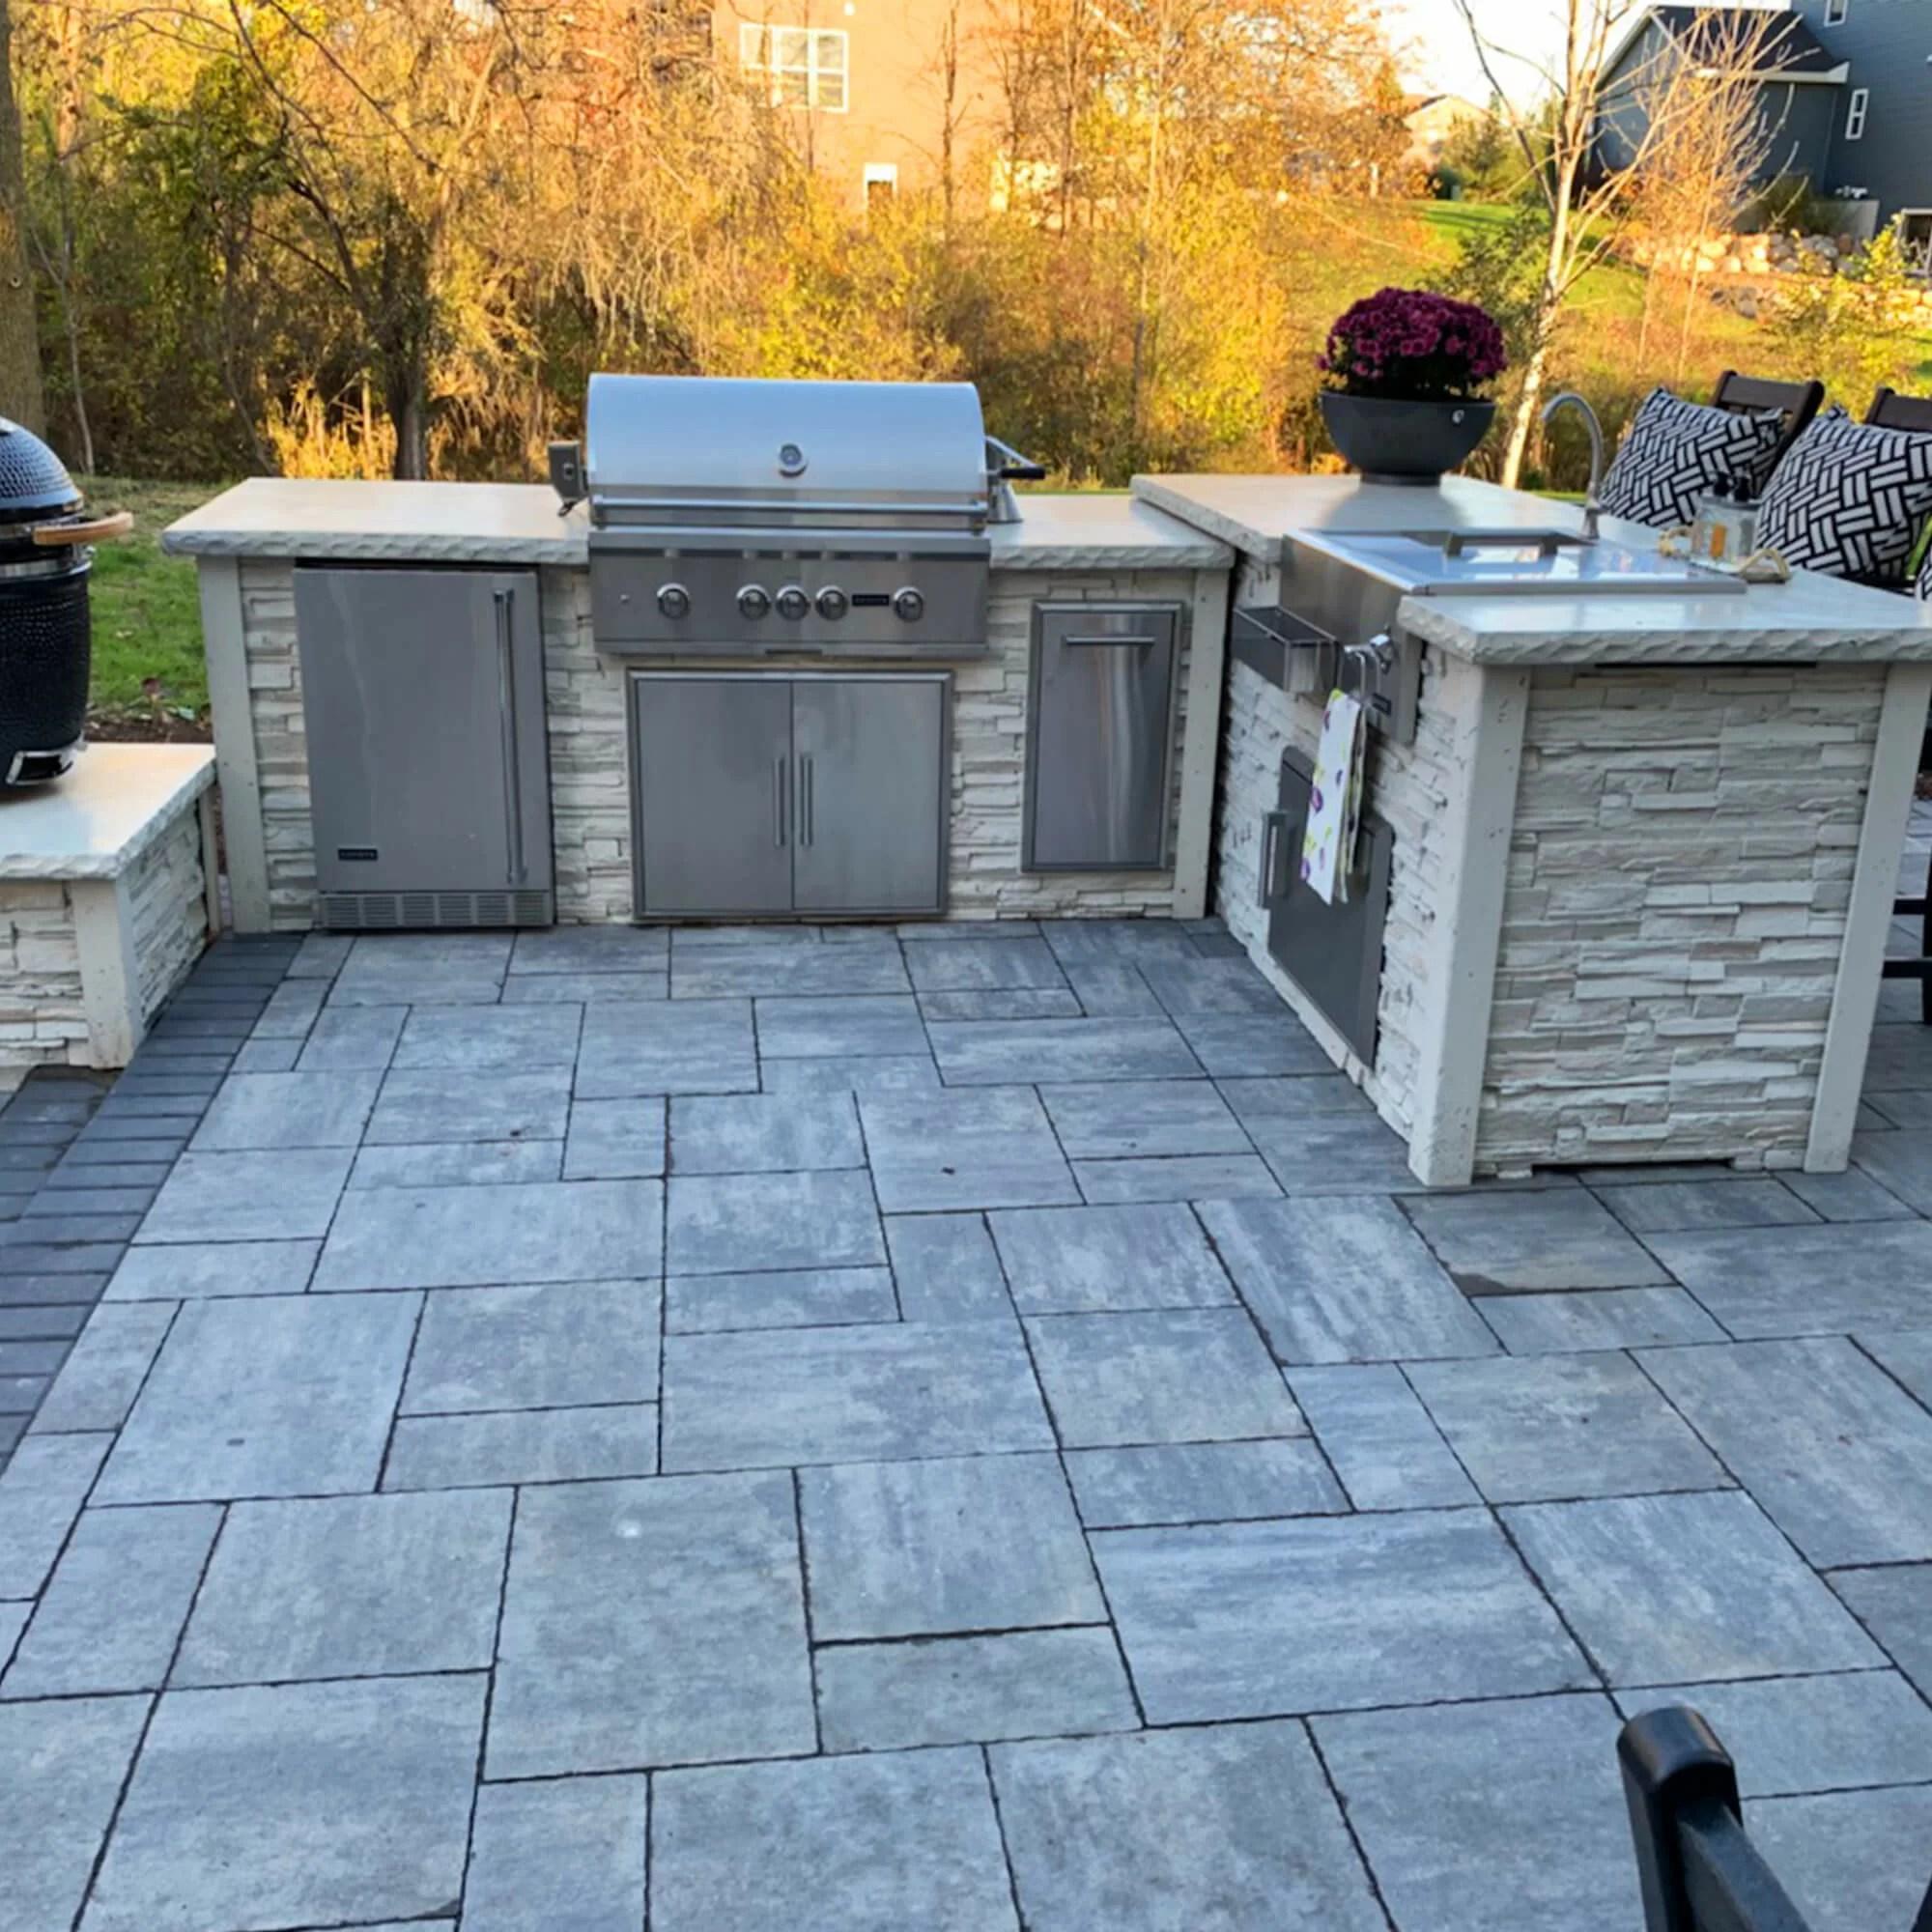 rta outdoor living 114 6 piece 5 burner bbq grill islands